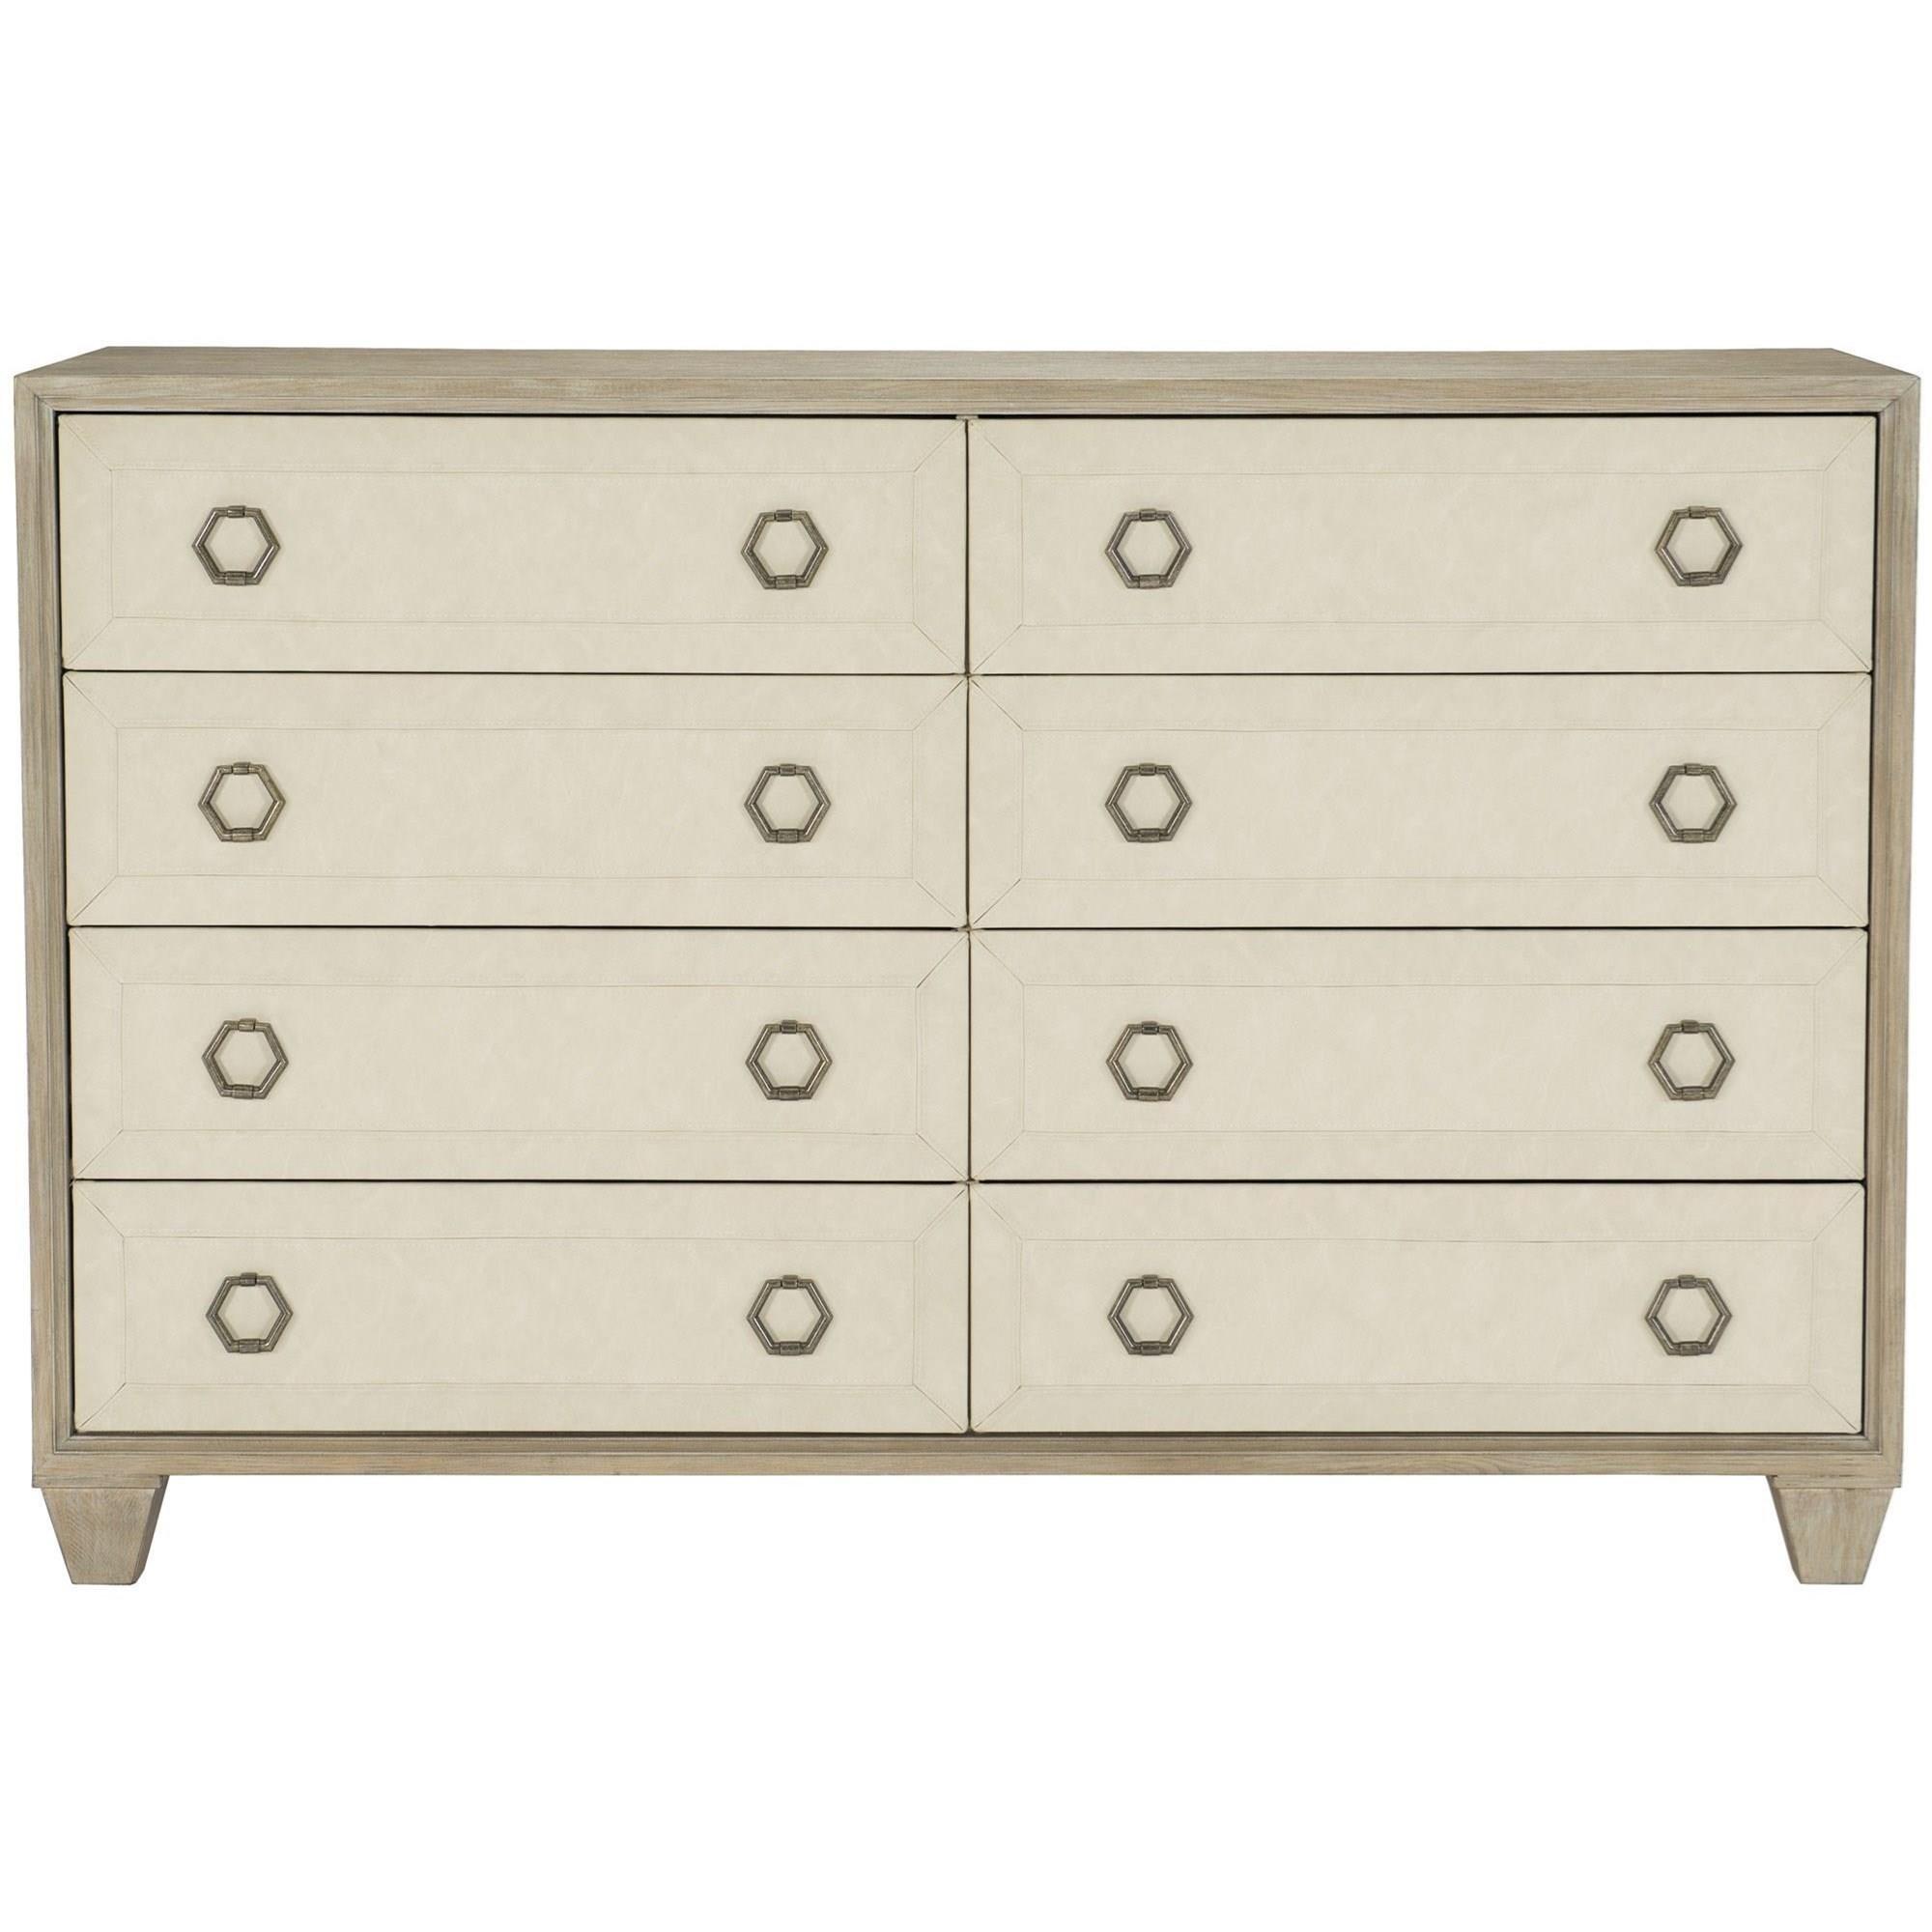 Santa Barbara Dresser by Bernhardt at Baer's Furniture